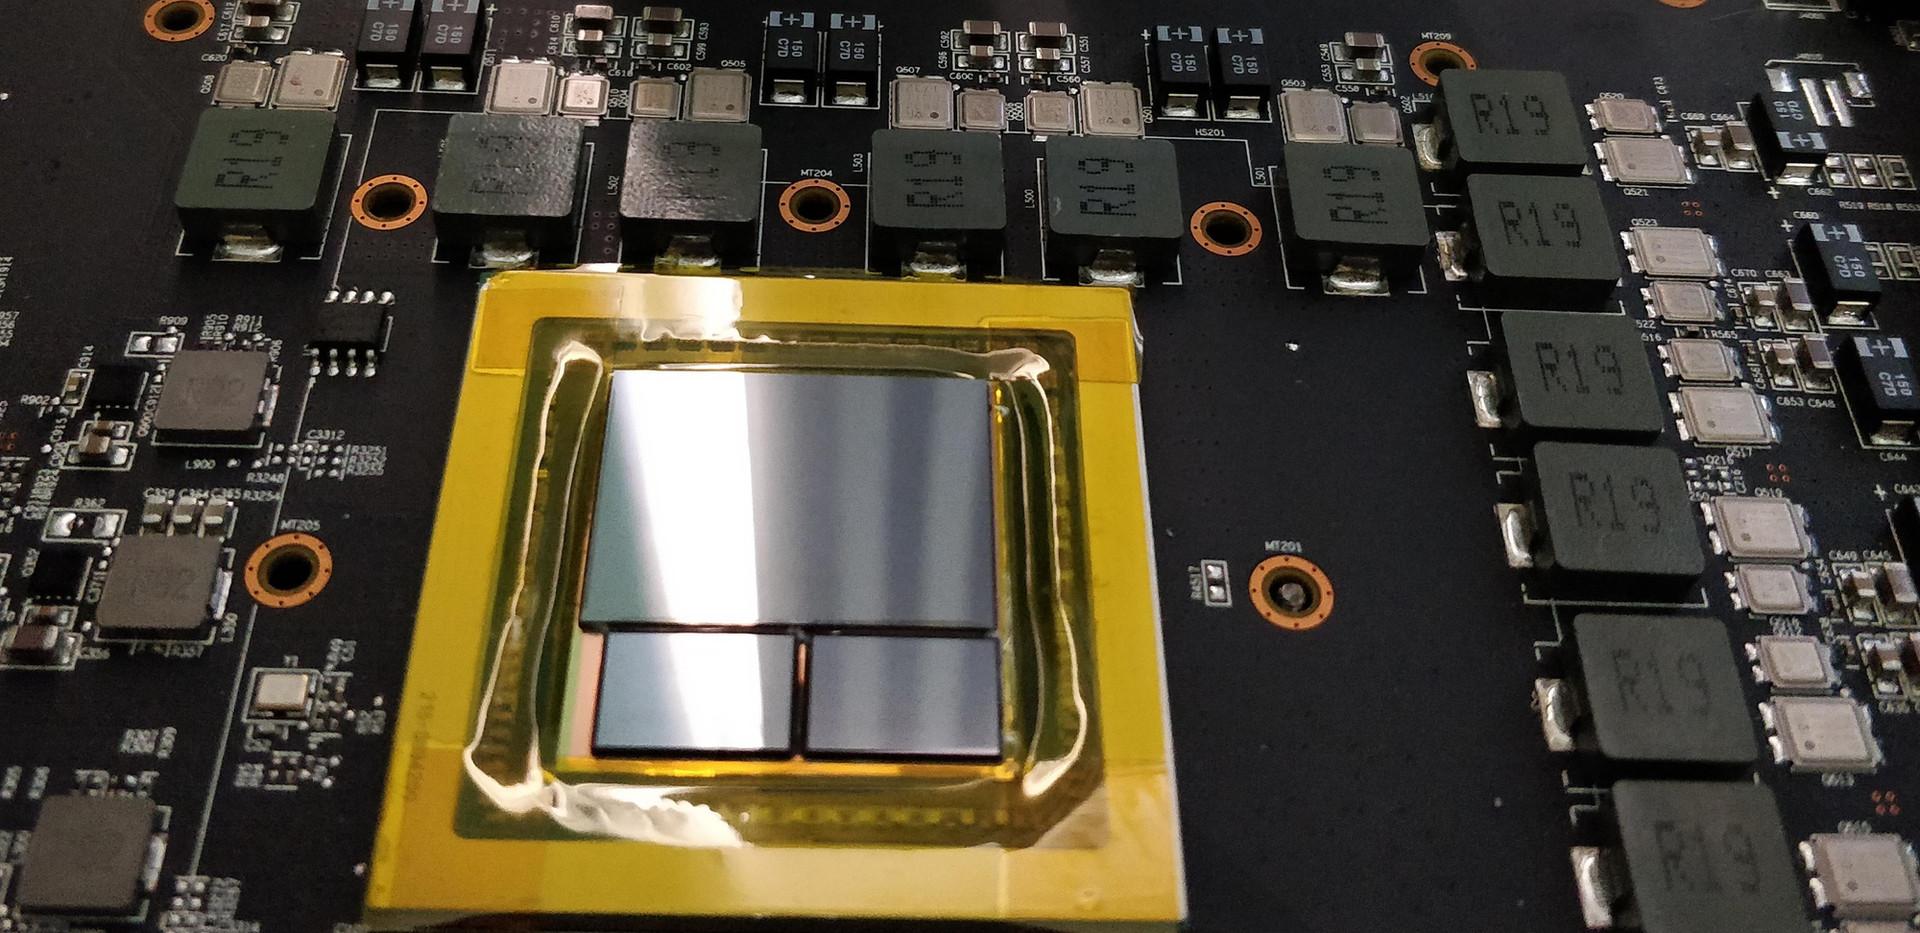 Vega 10 GPU package with dual stack HBM2